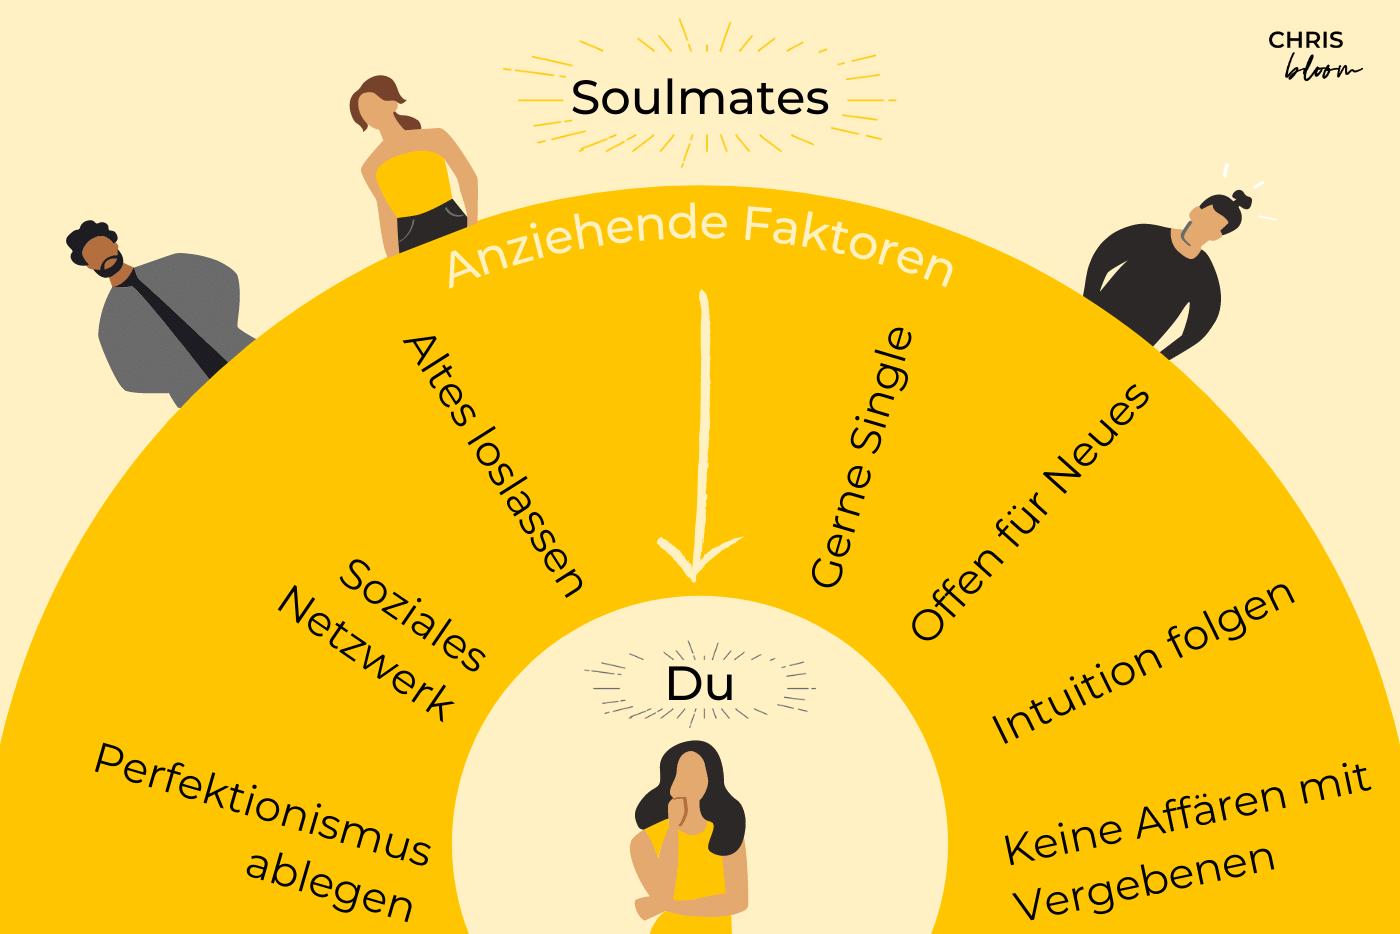 Soulmate finden